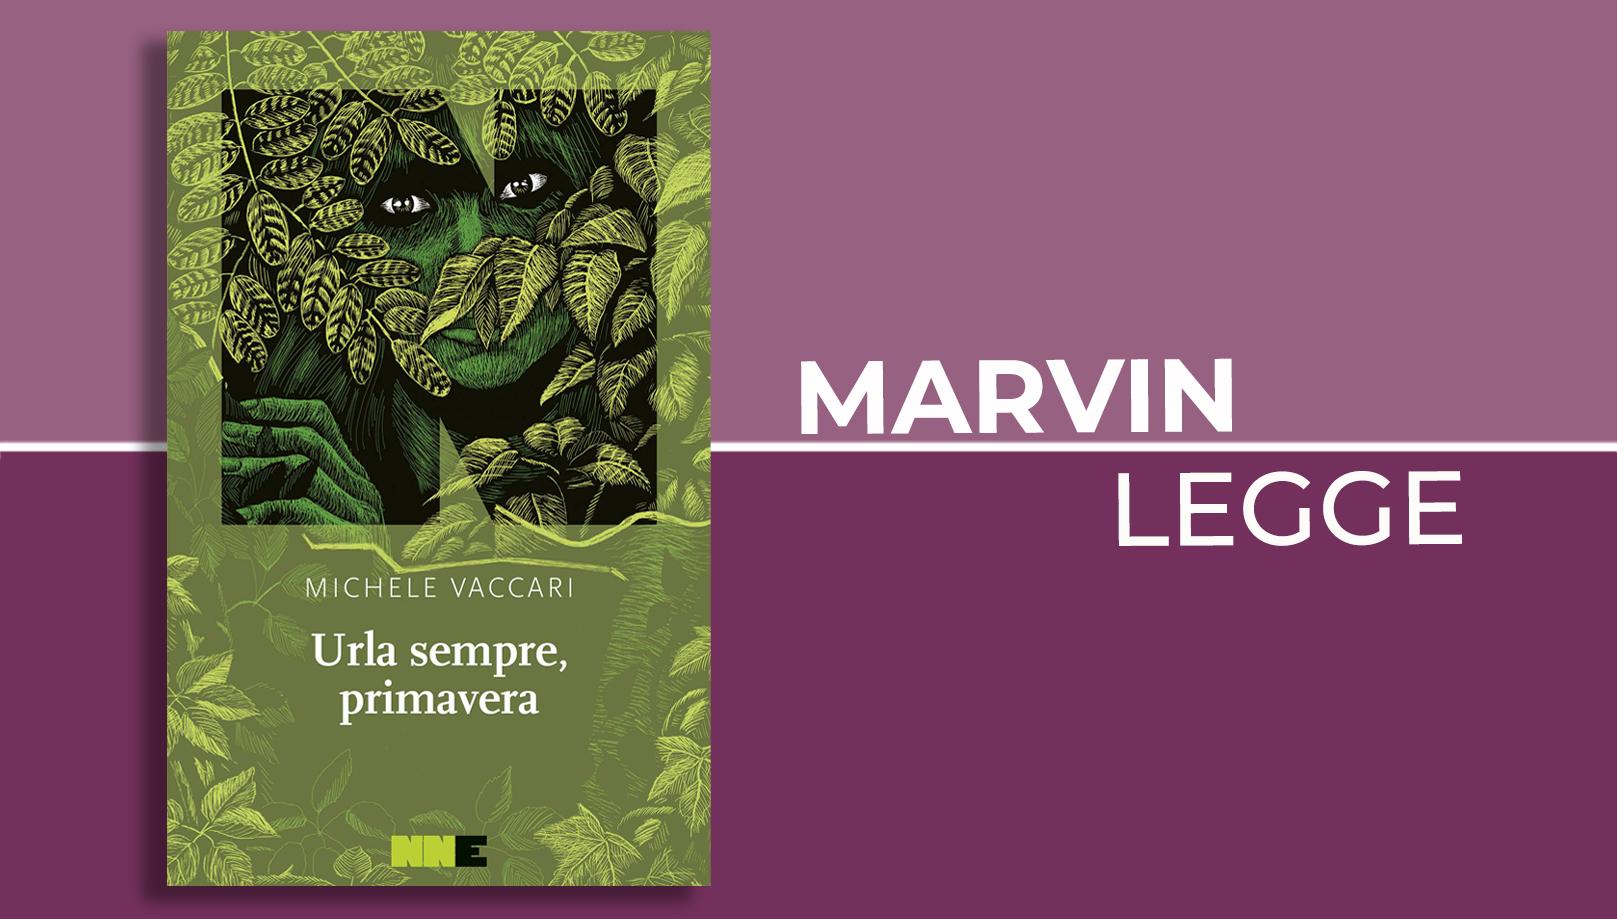 Marvin_UrlaSemprePrimavera